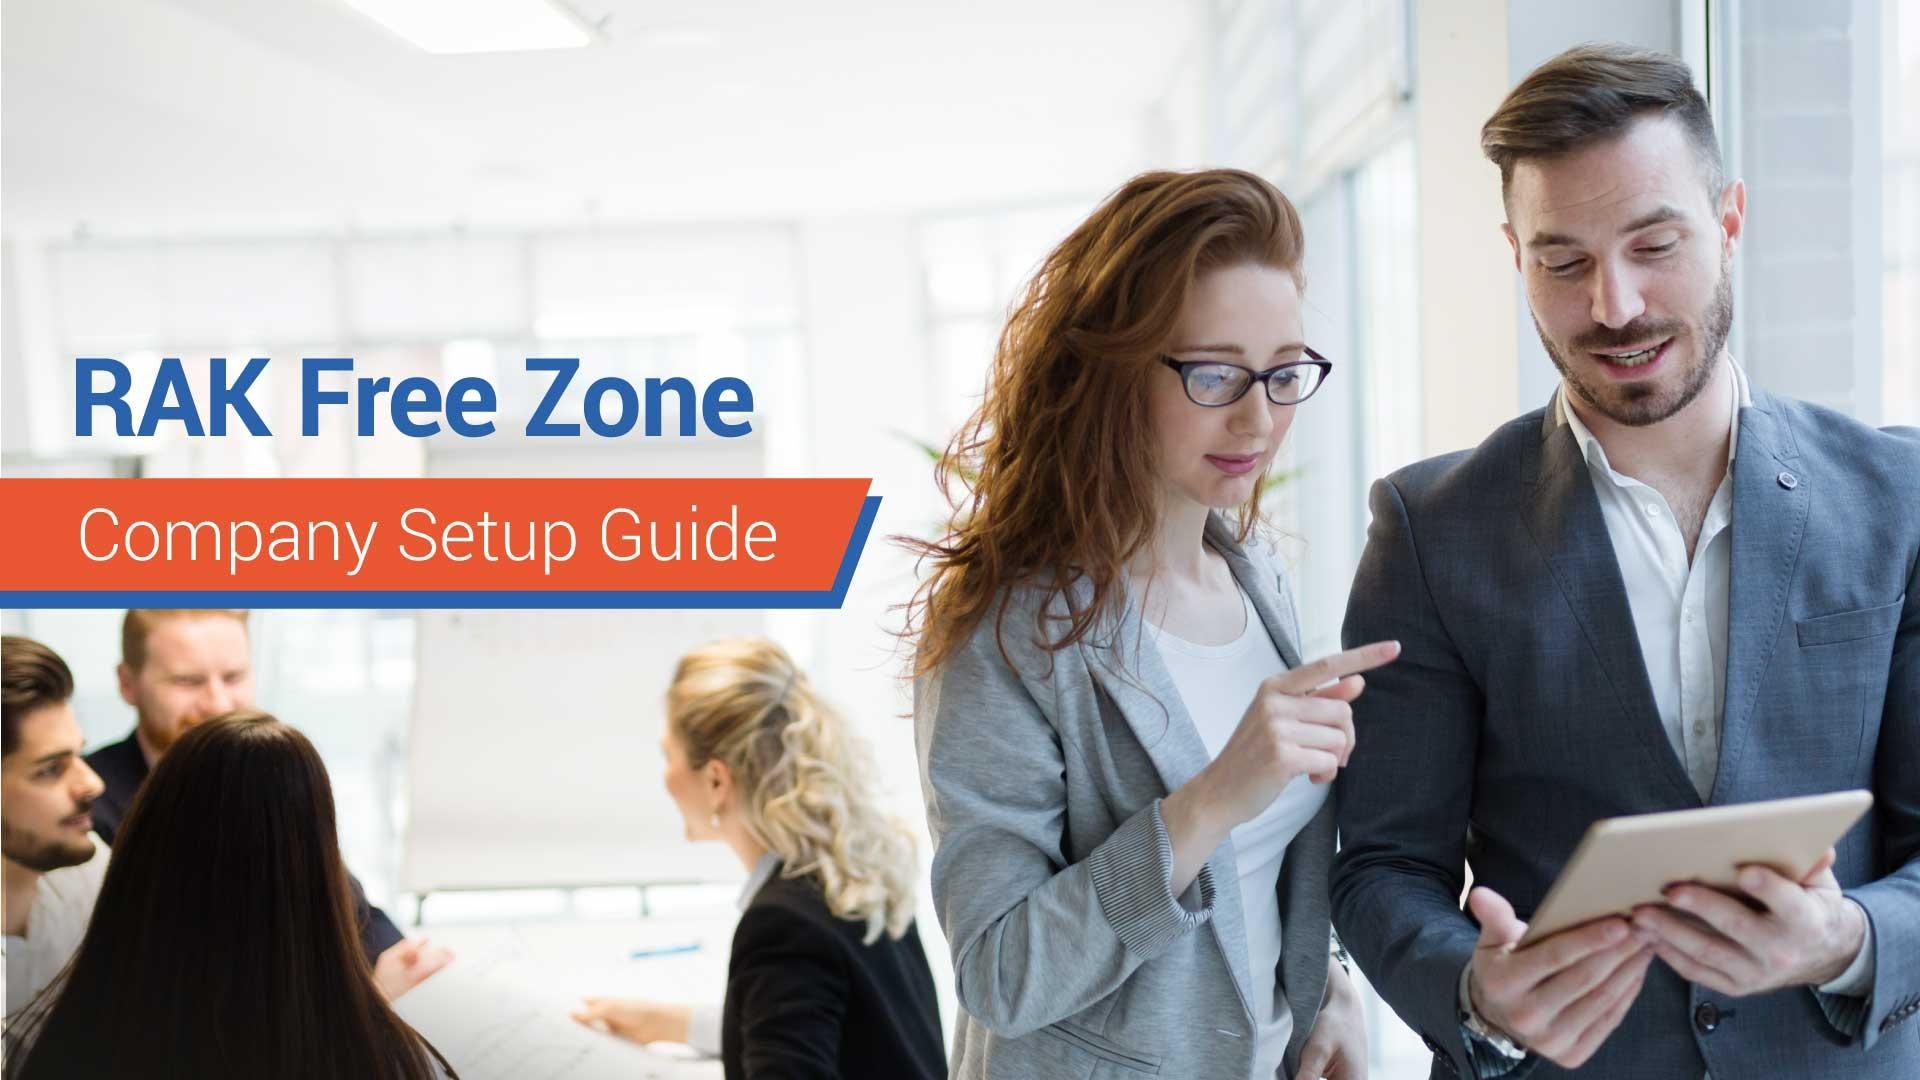 RAK Free Zone Company Setup Guide - Official CREATIVE ZONE Website